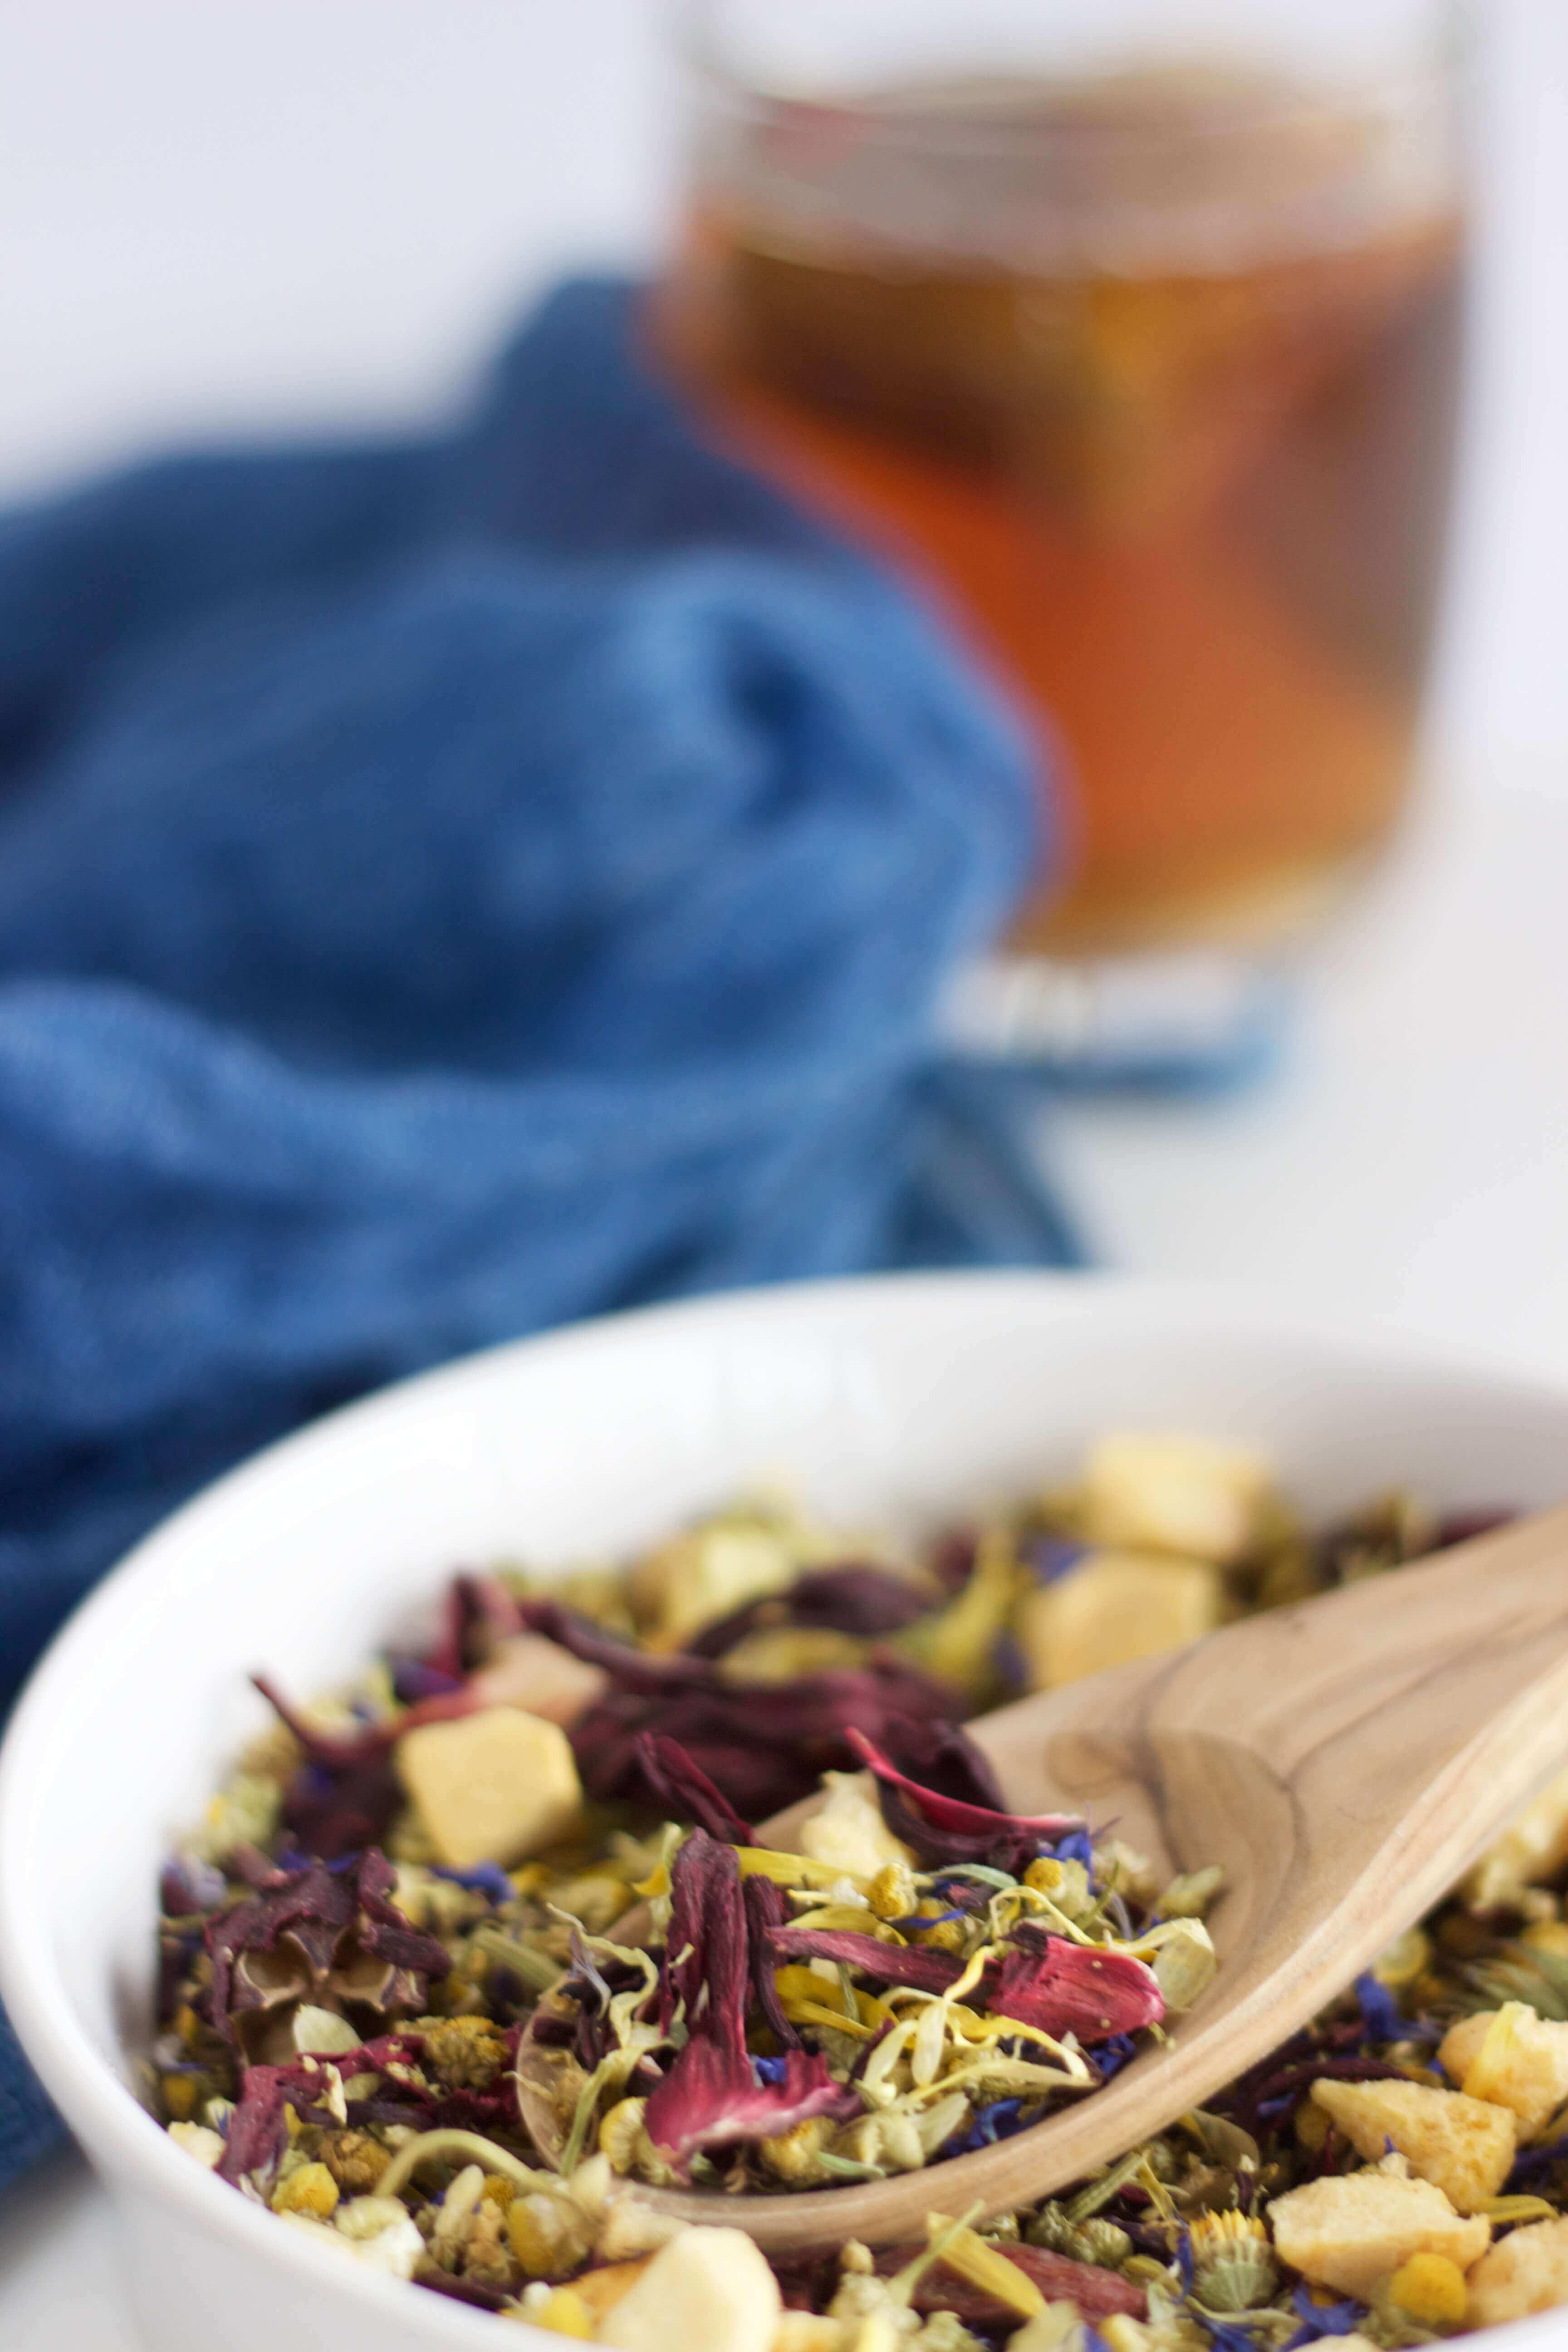 The Art of Tea Crafting